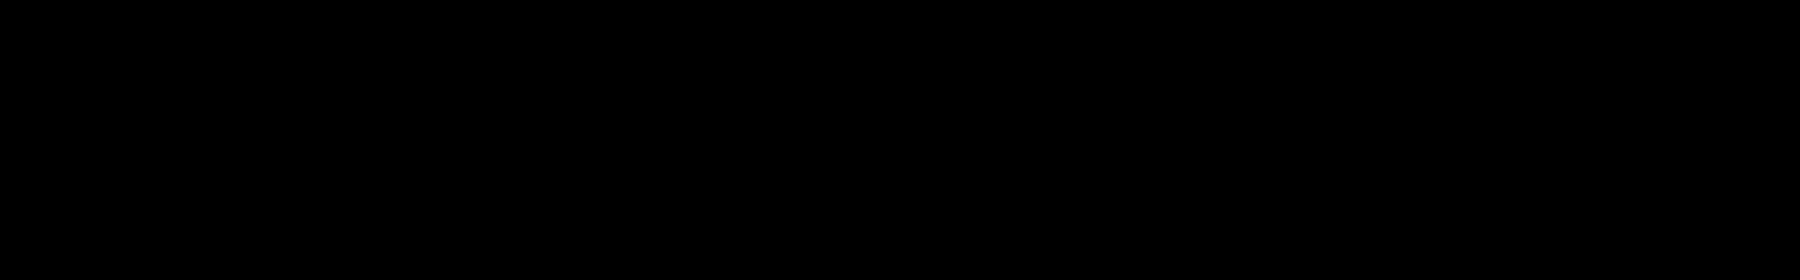 Afterglow audio waveform